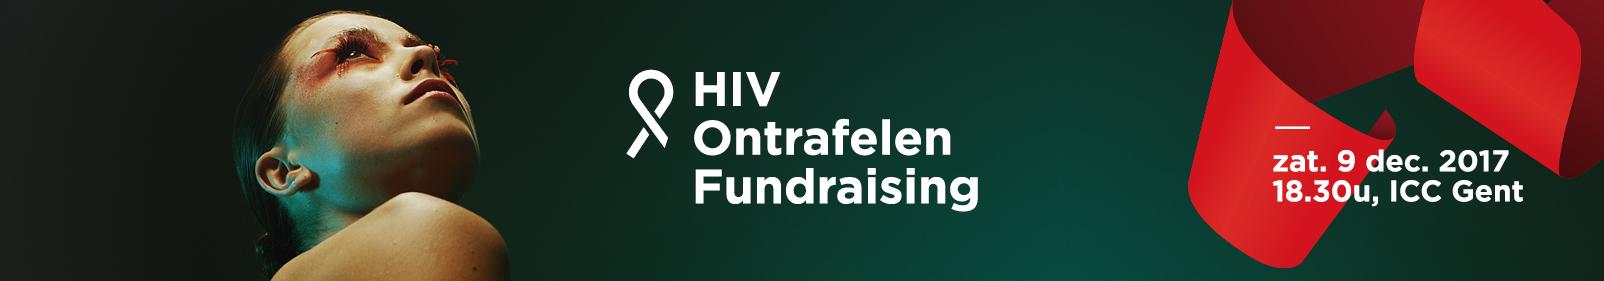 HIV ontrafelen 2017